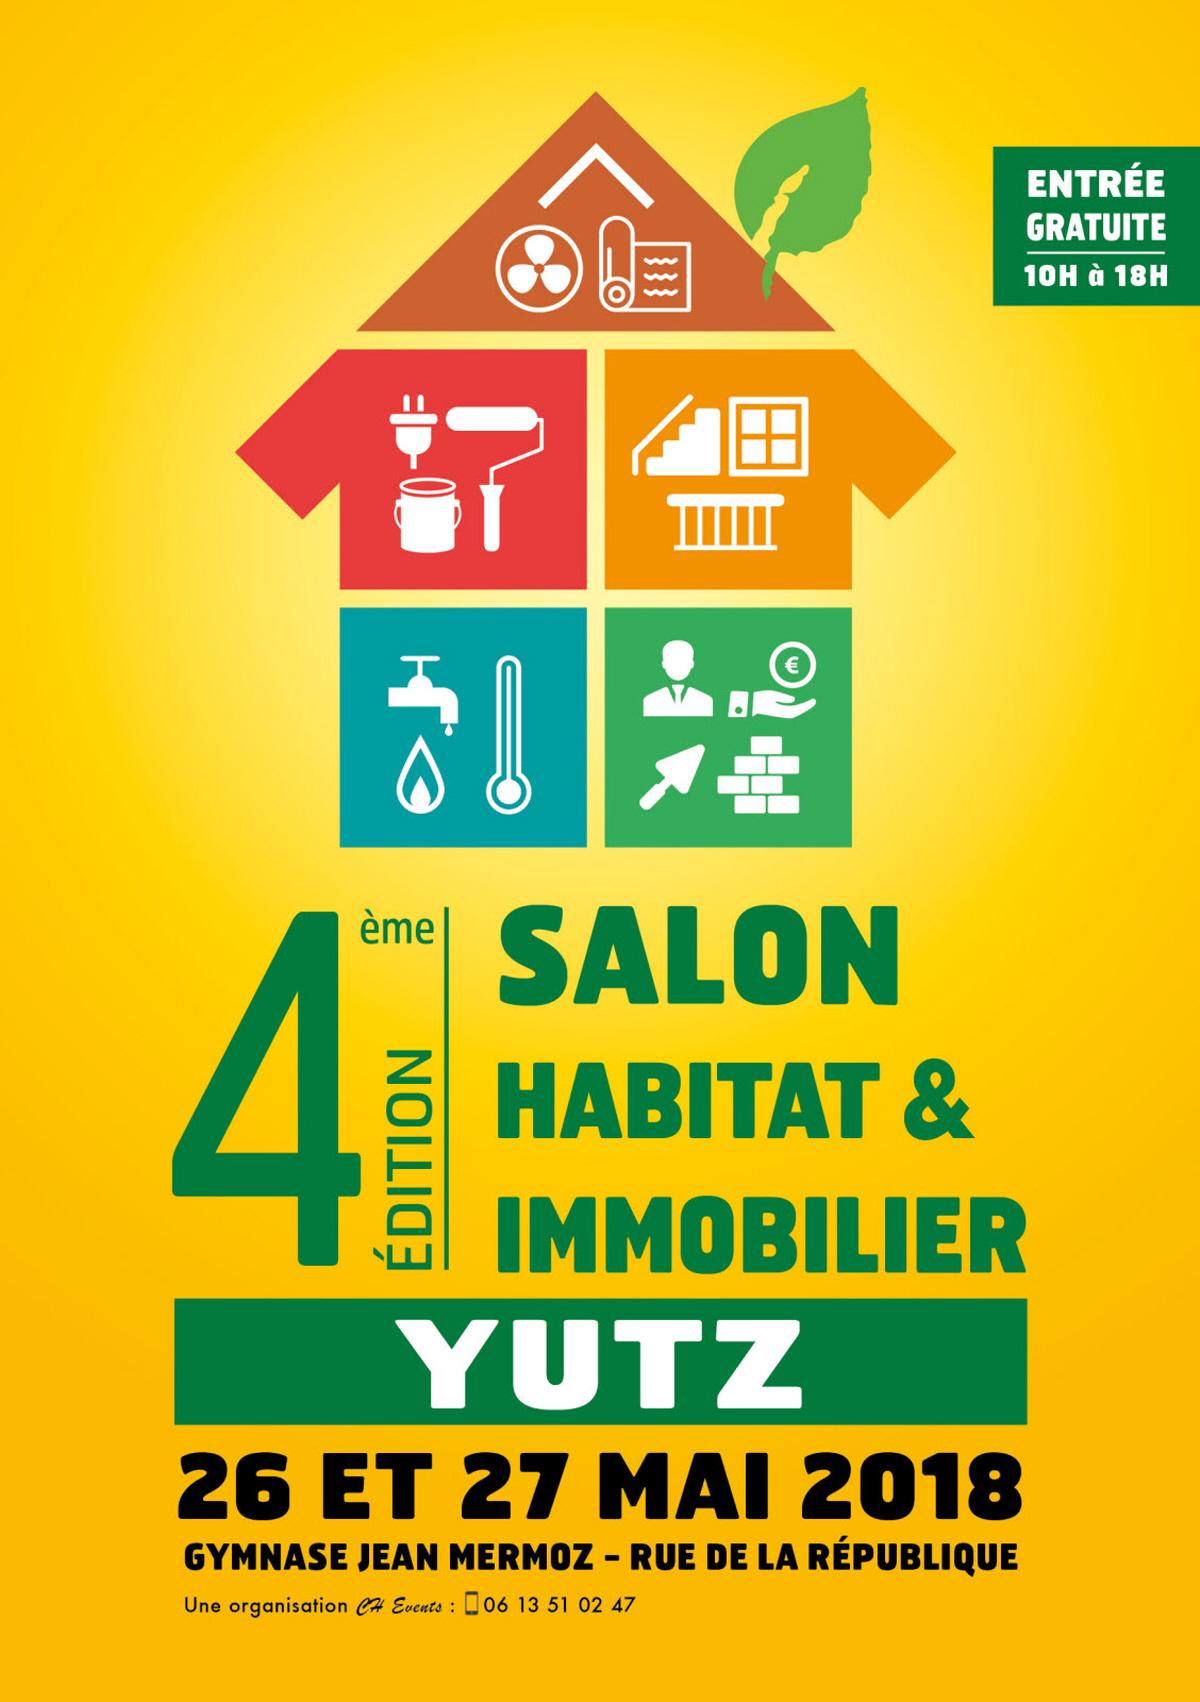 Illustration Salon Habitat Immobilier 1 1511562435 Imb 9r